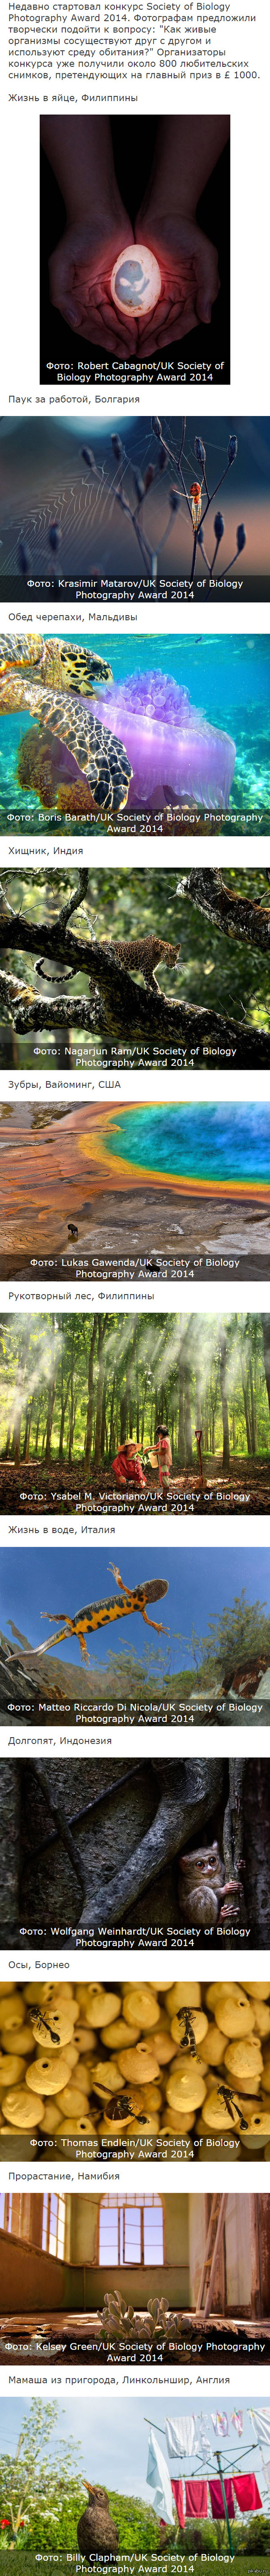 Фотоконкурс Society of Biology Photography Award 2014